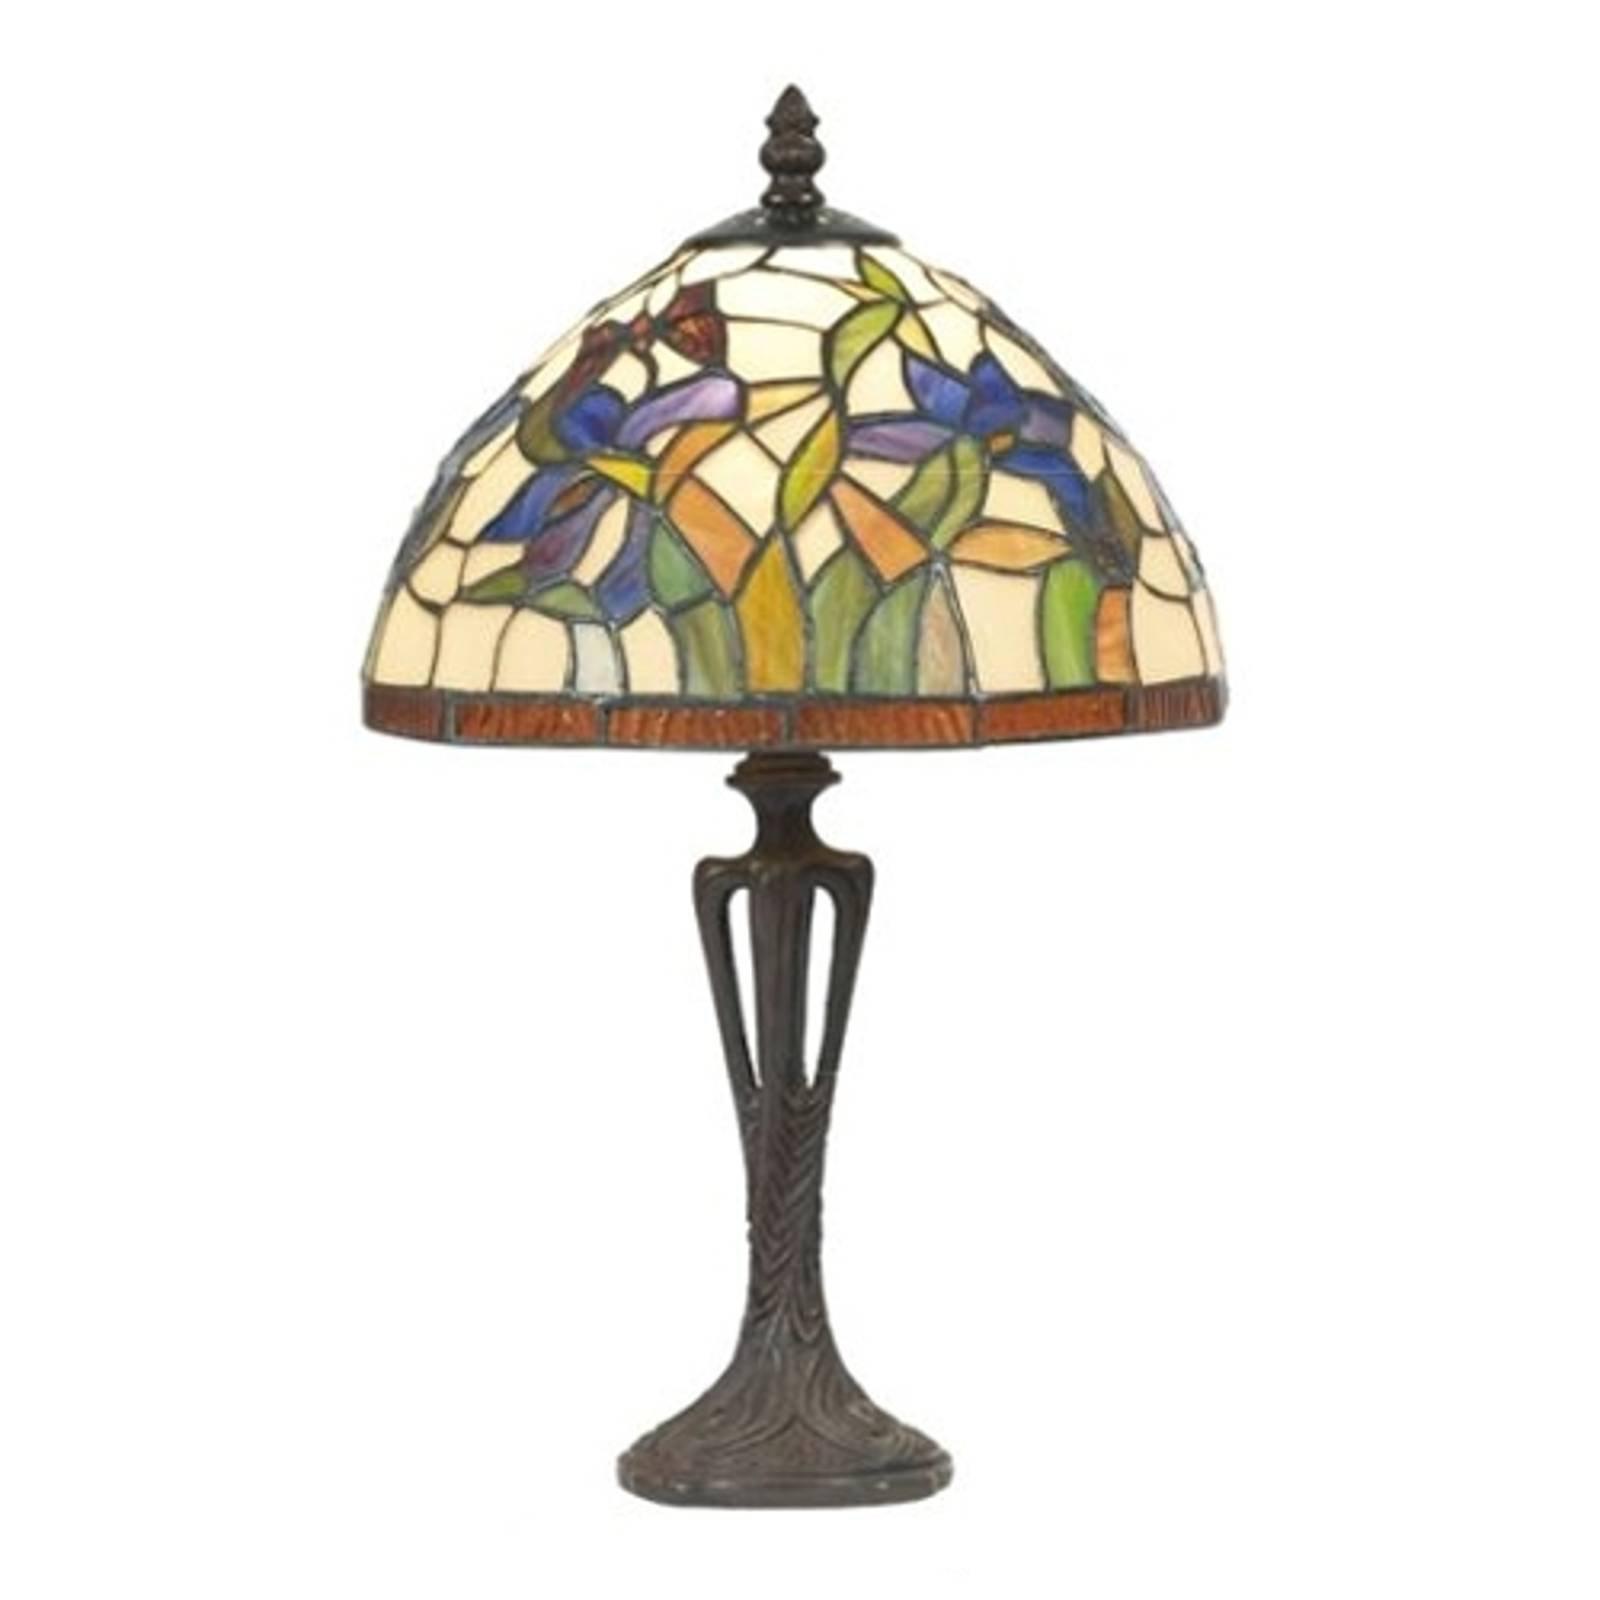 Diskret ELANDA bordlampe i Tiffany-stil på 41 cm